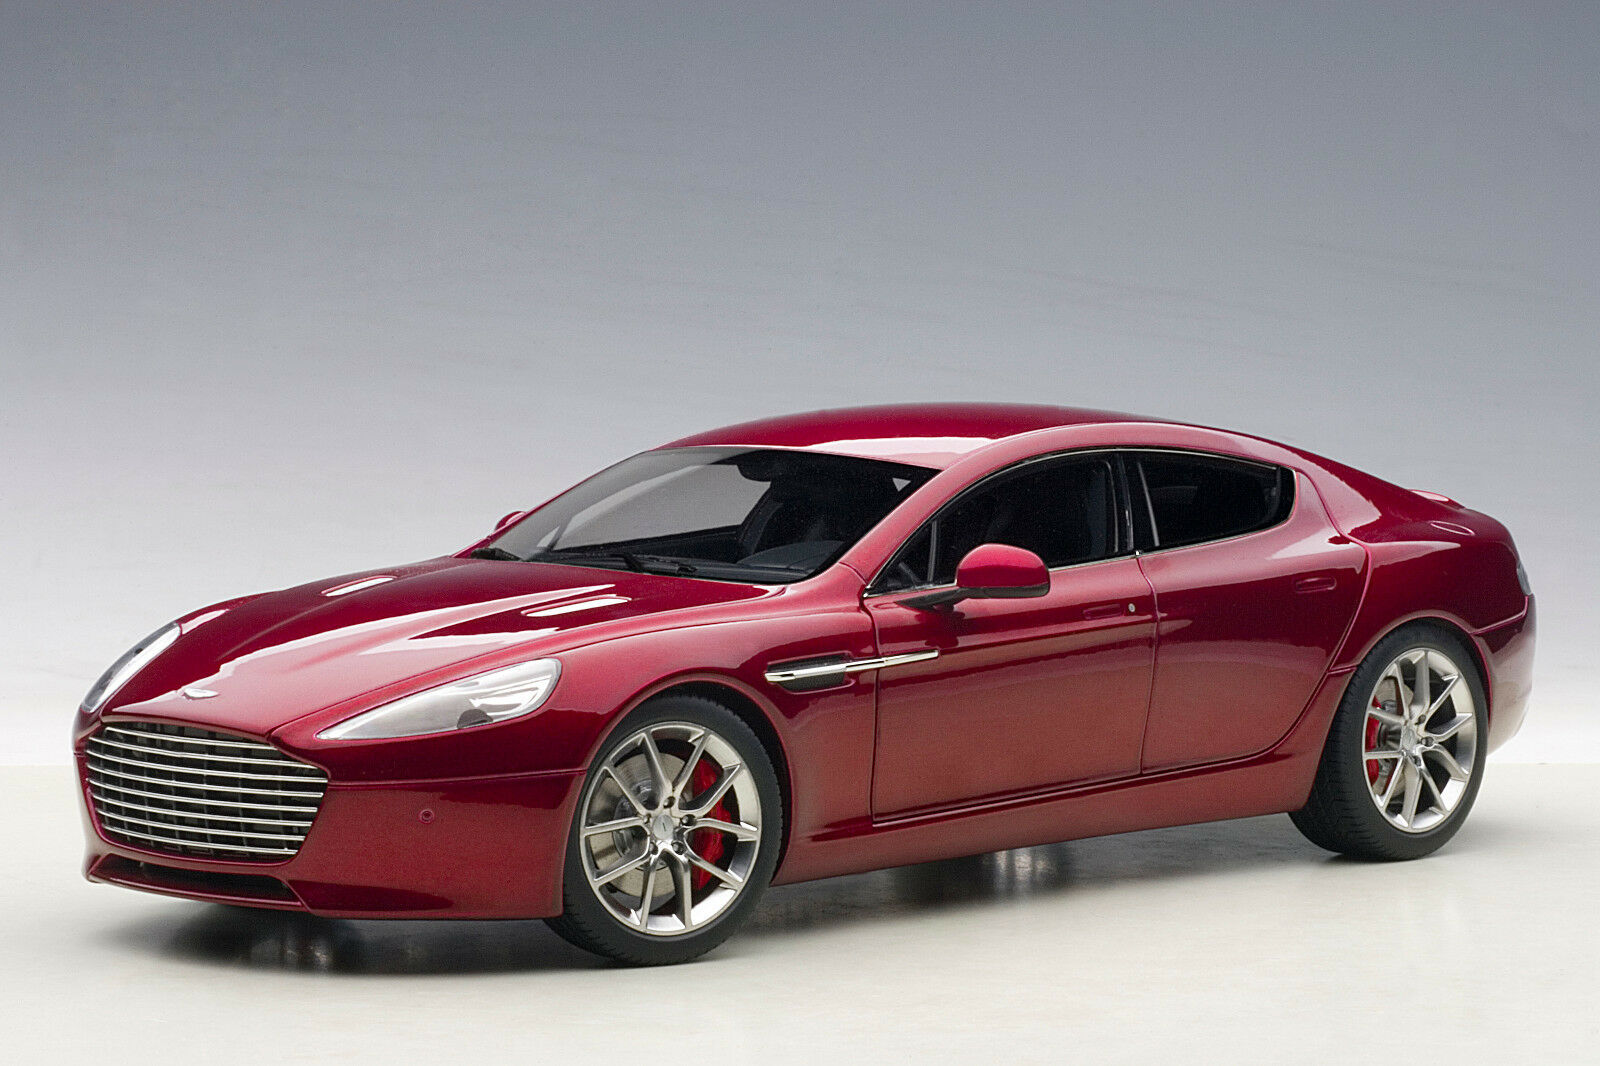 AUTOart 70257 Aston Martin Rapide S 2015 - red (diavolo red)  1 18 NEU OVP